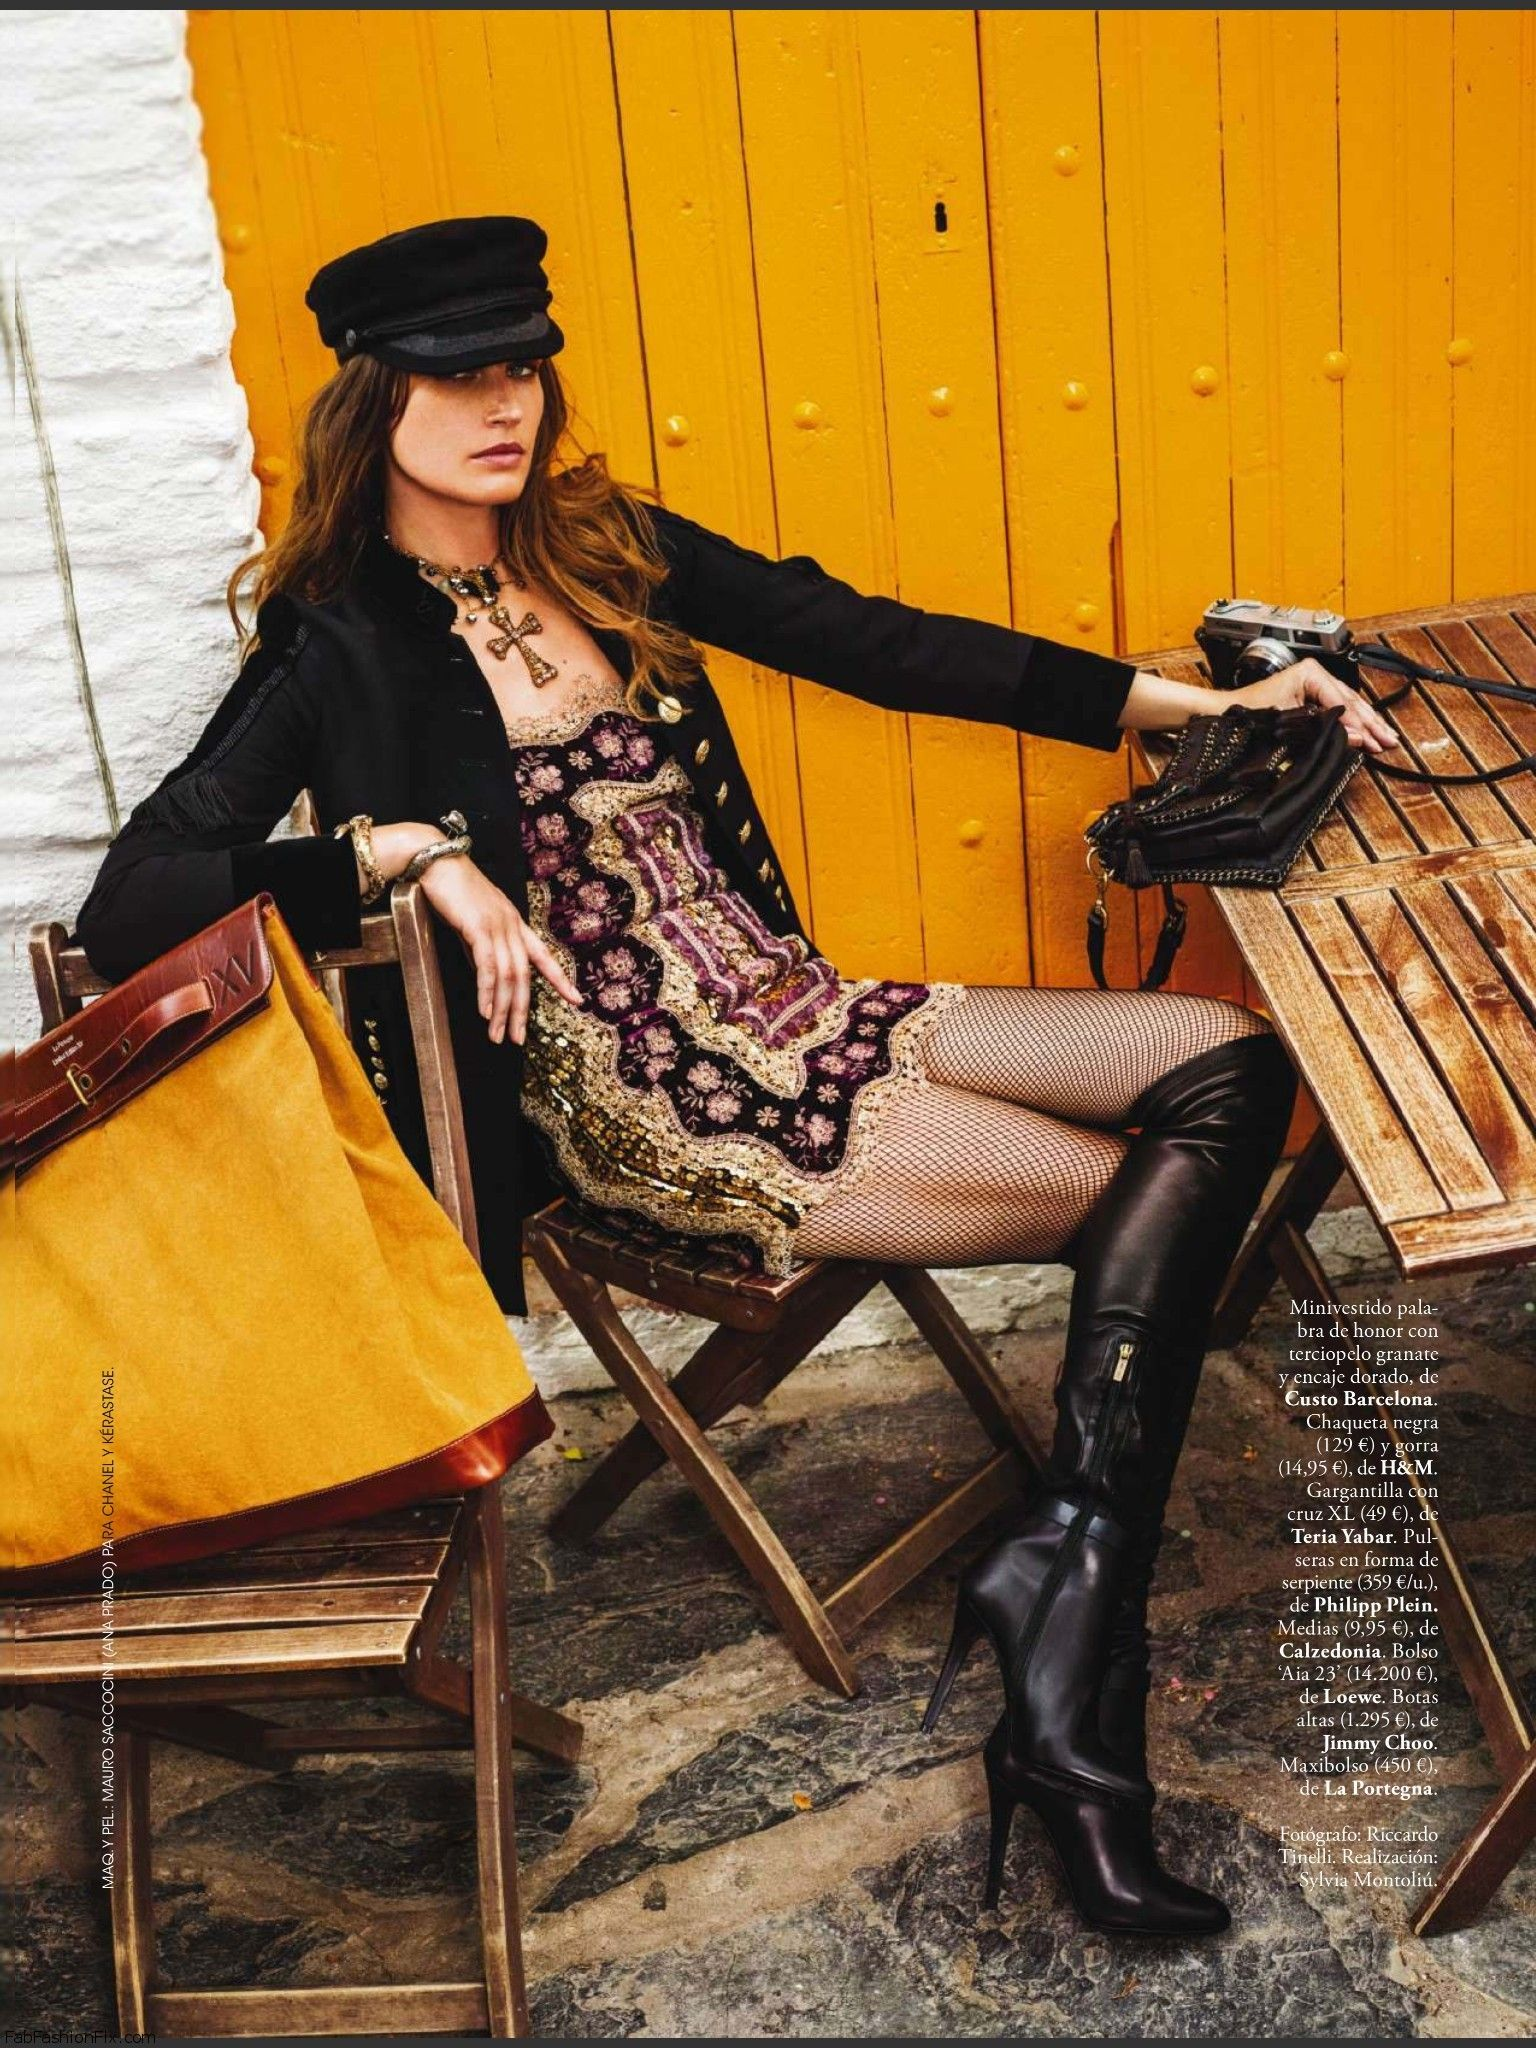 fashion_scans_remastered-eugenia_volodina-elle_espana-september_2013-scanned_by_vampirehorde-hq-18